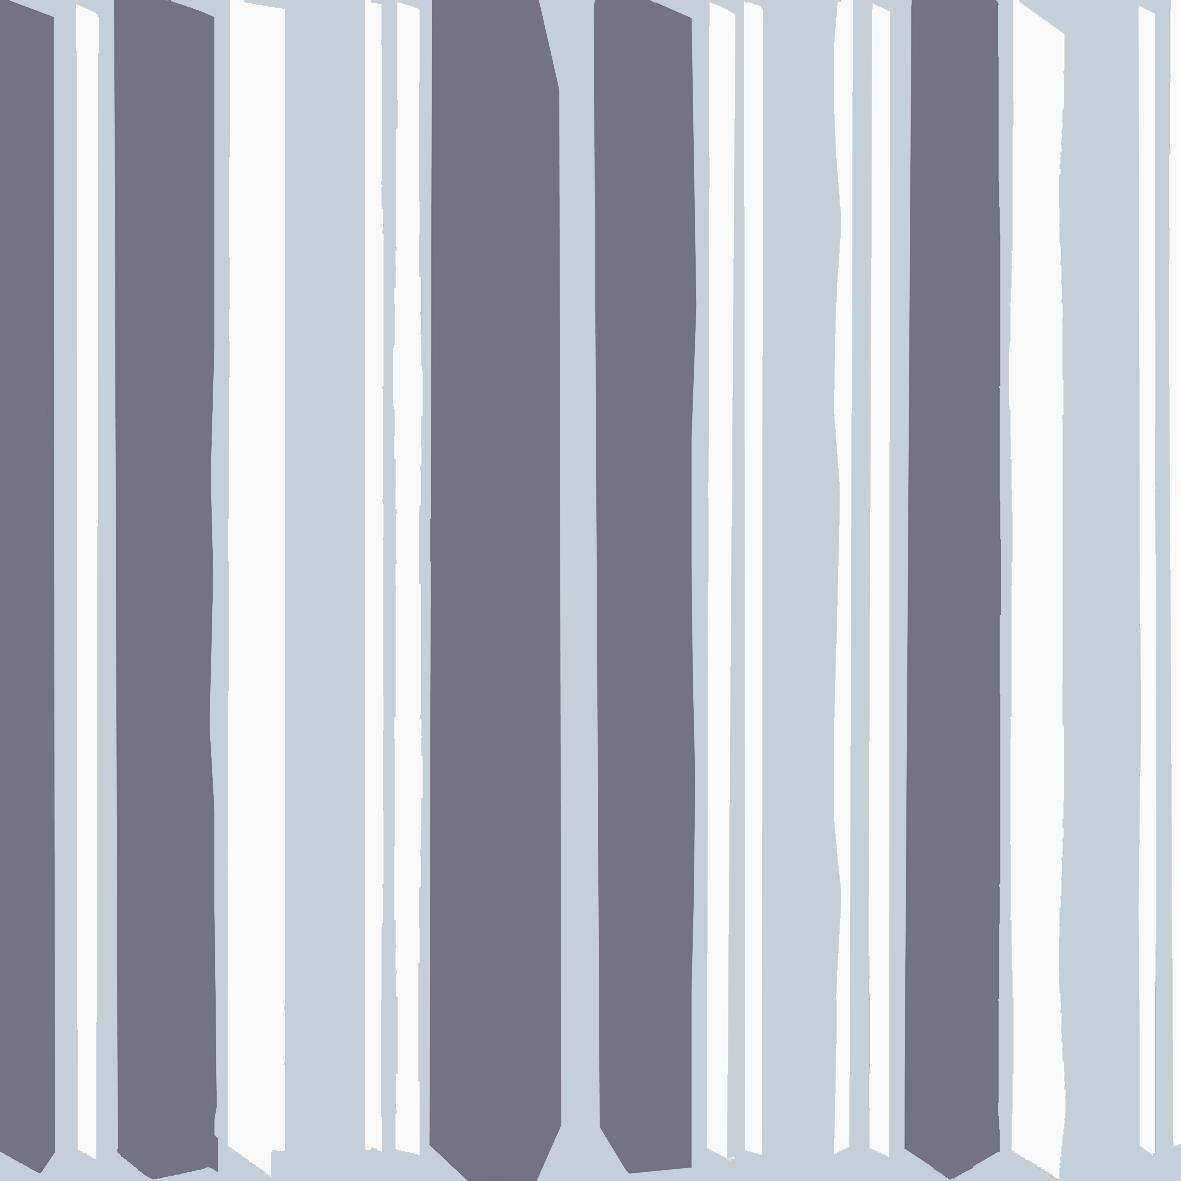 Tile design Plank